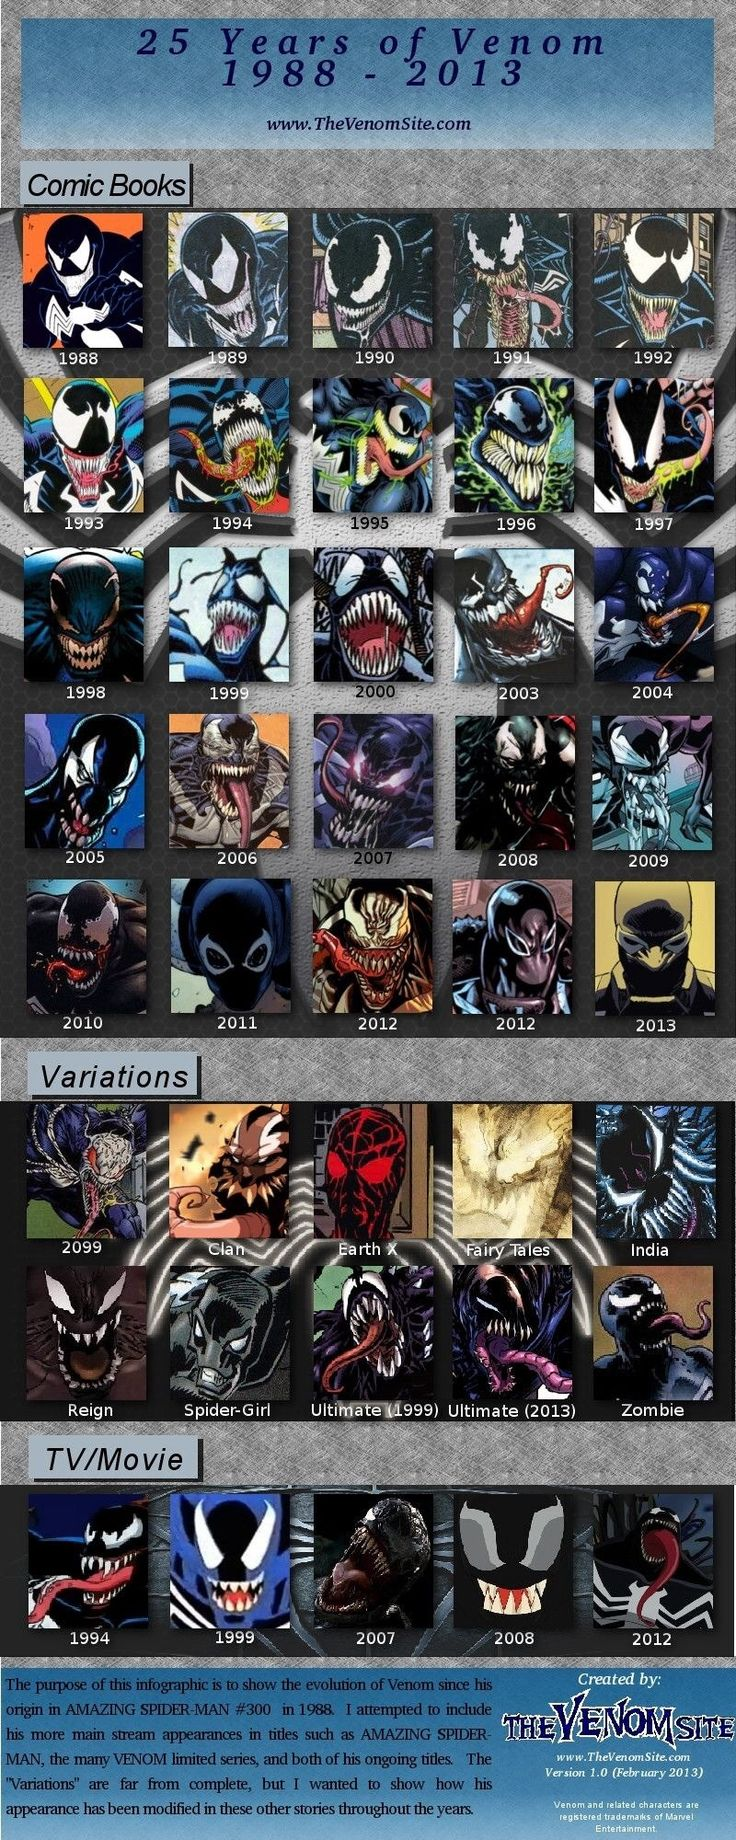 Brutal Joker Vs Batman Art By Ardian Syaf Geektyrant (12